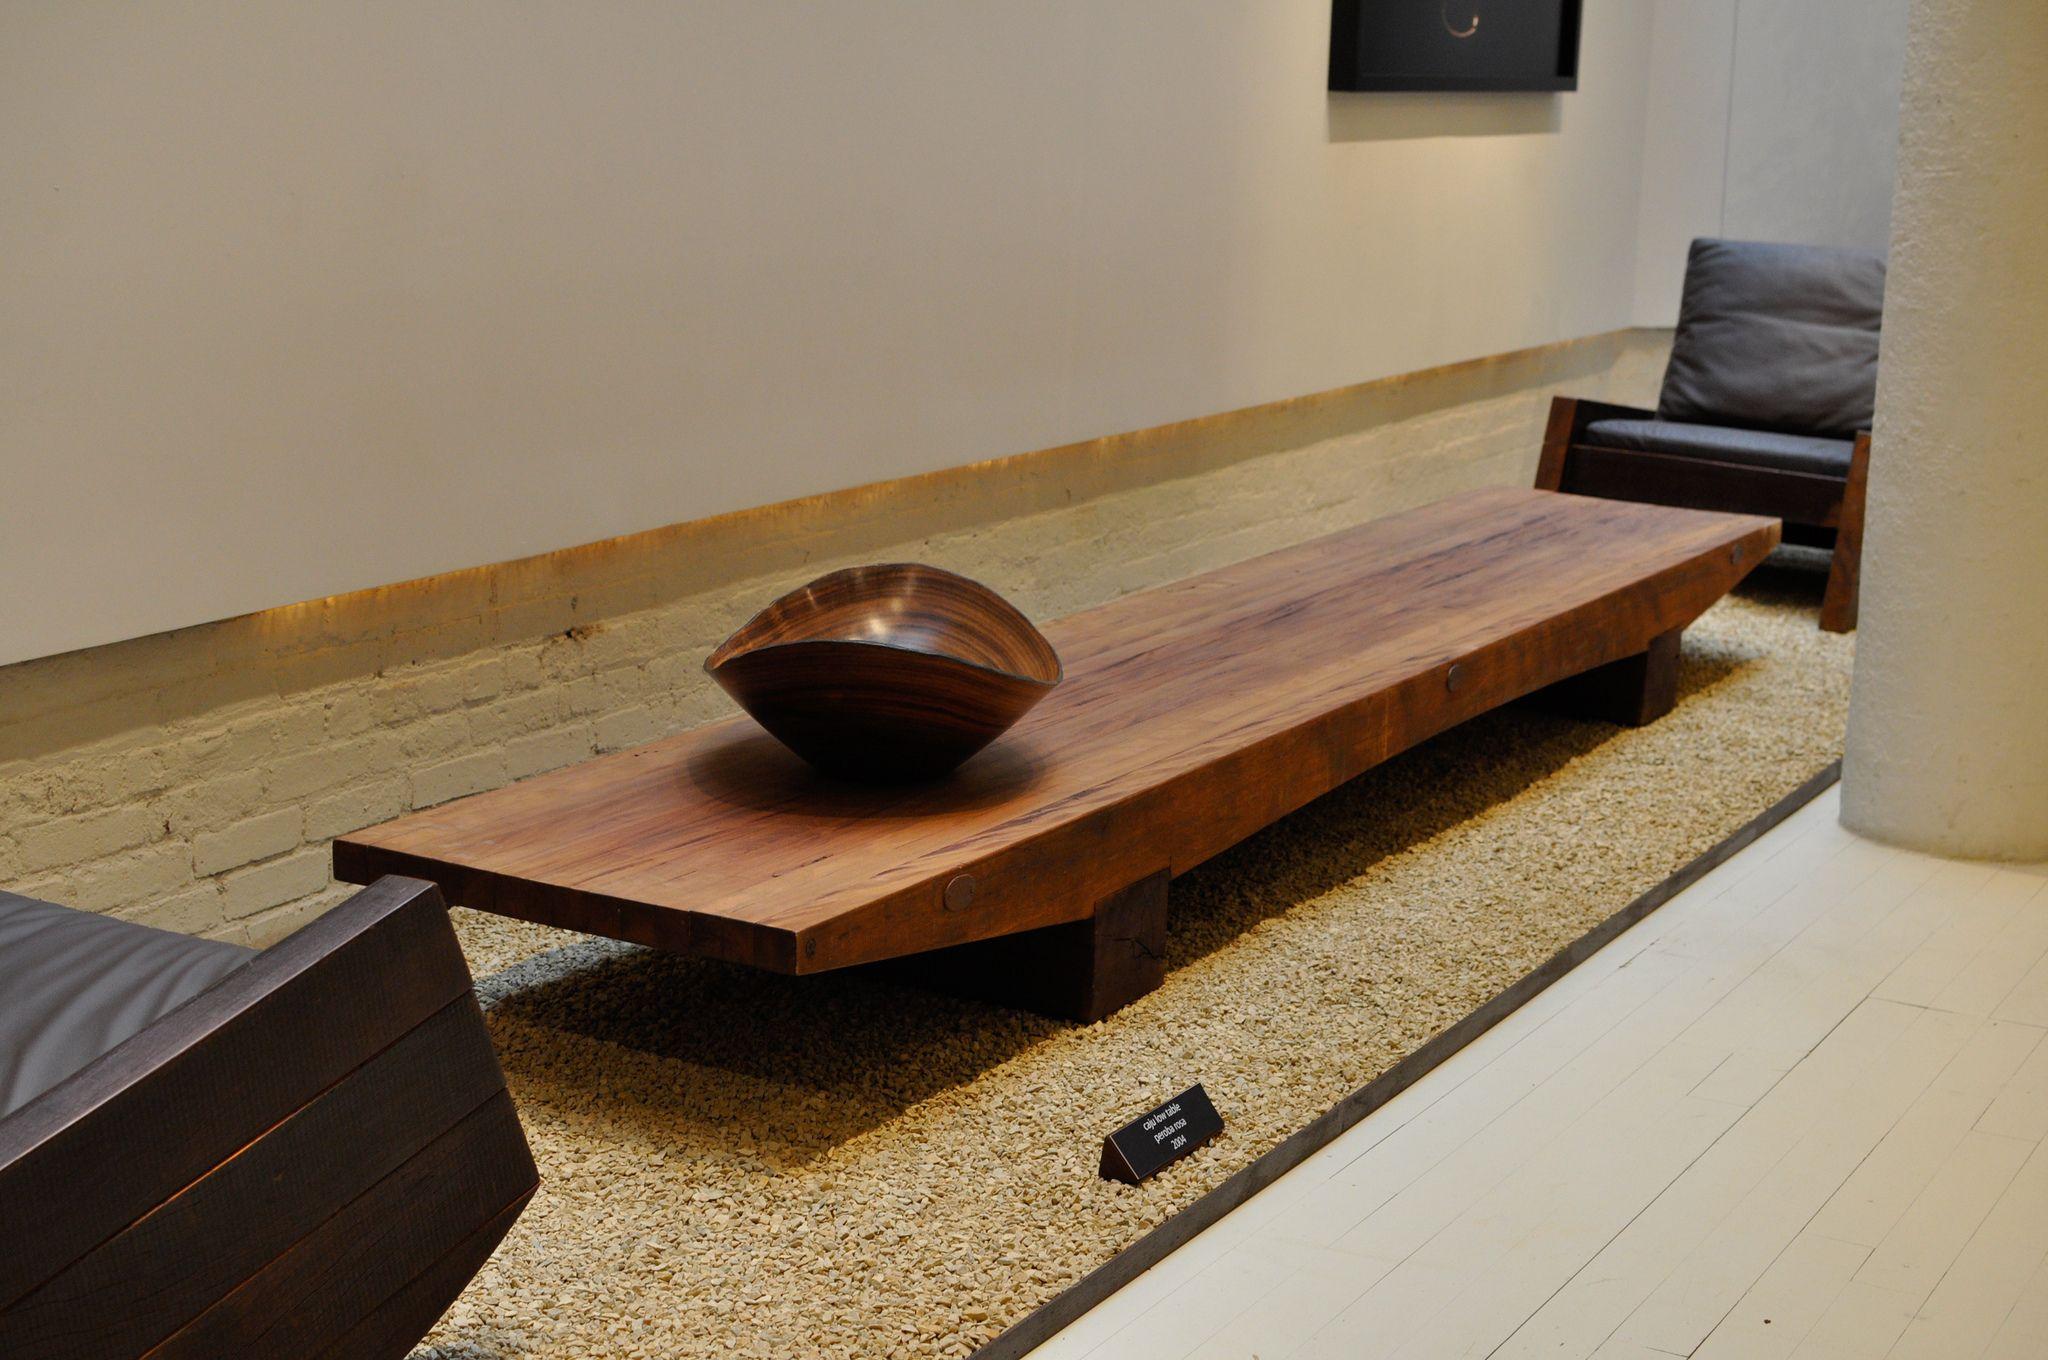 Caju Coffee Table Bench Designed By Carlos Motta Available At Espasso Contemporary Brazilian Design Coffee Table Coffee Table Bench Table [ 1360 x 2048 Pixel ]